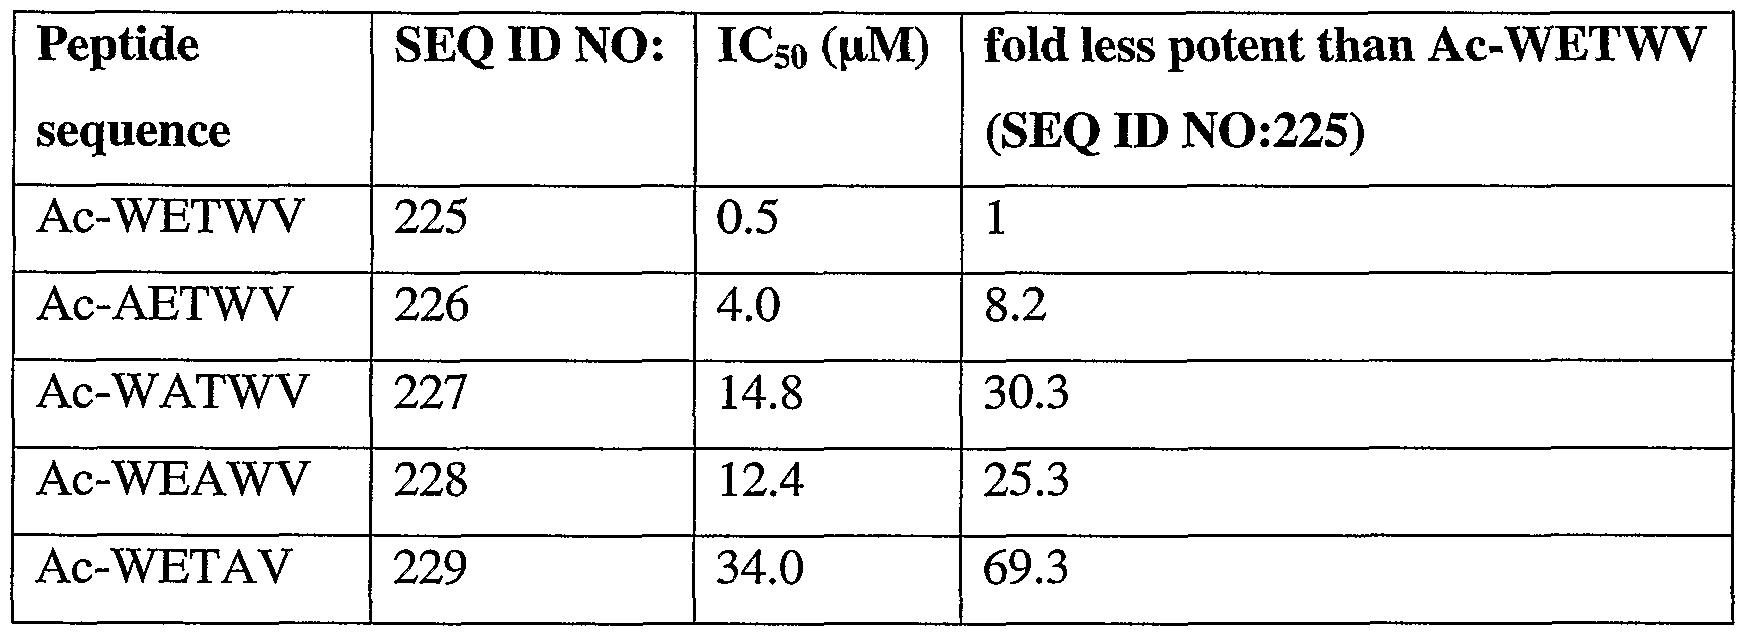 Wo2003004604a9 Phage Displayed Pdz Domain Ligands Google Patents 1995 Gm Fleetwood Brogh 57 Fuse Box Diagram Figure Imgf000152 0001